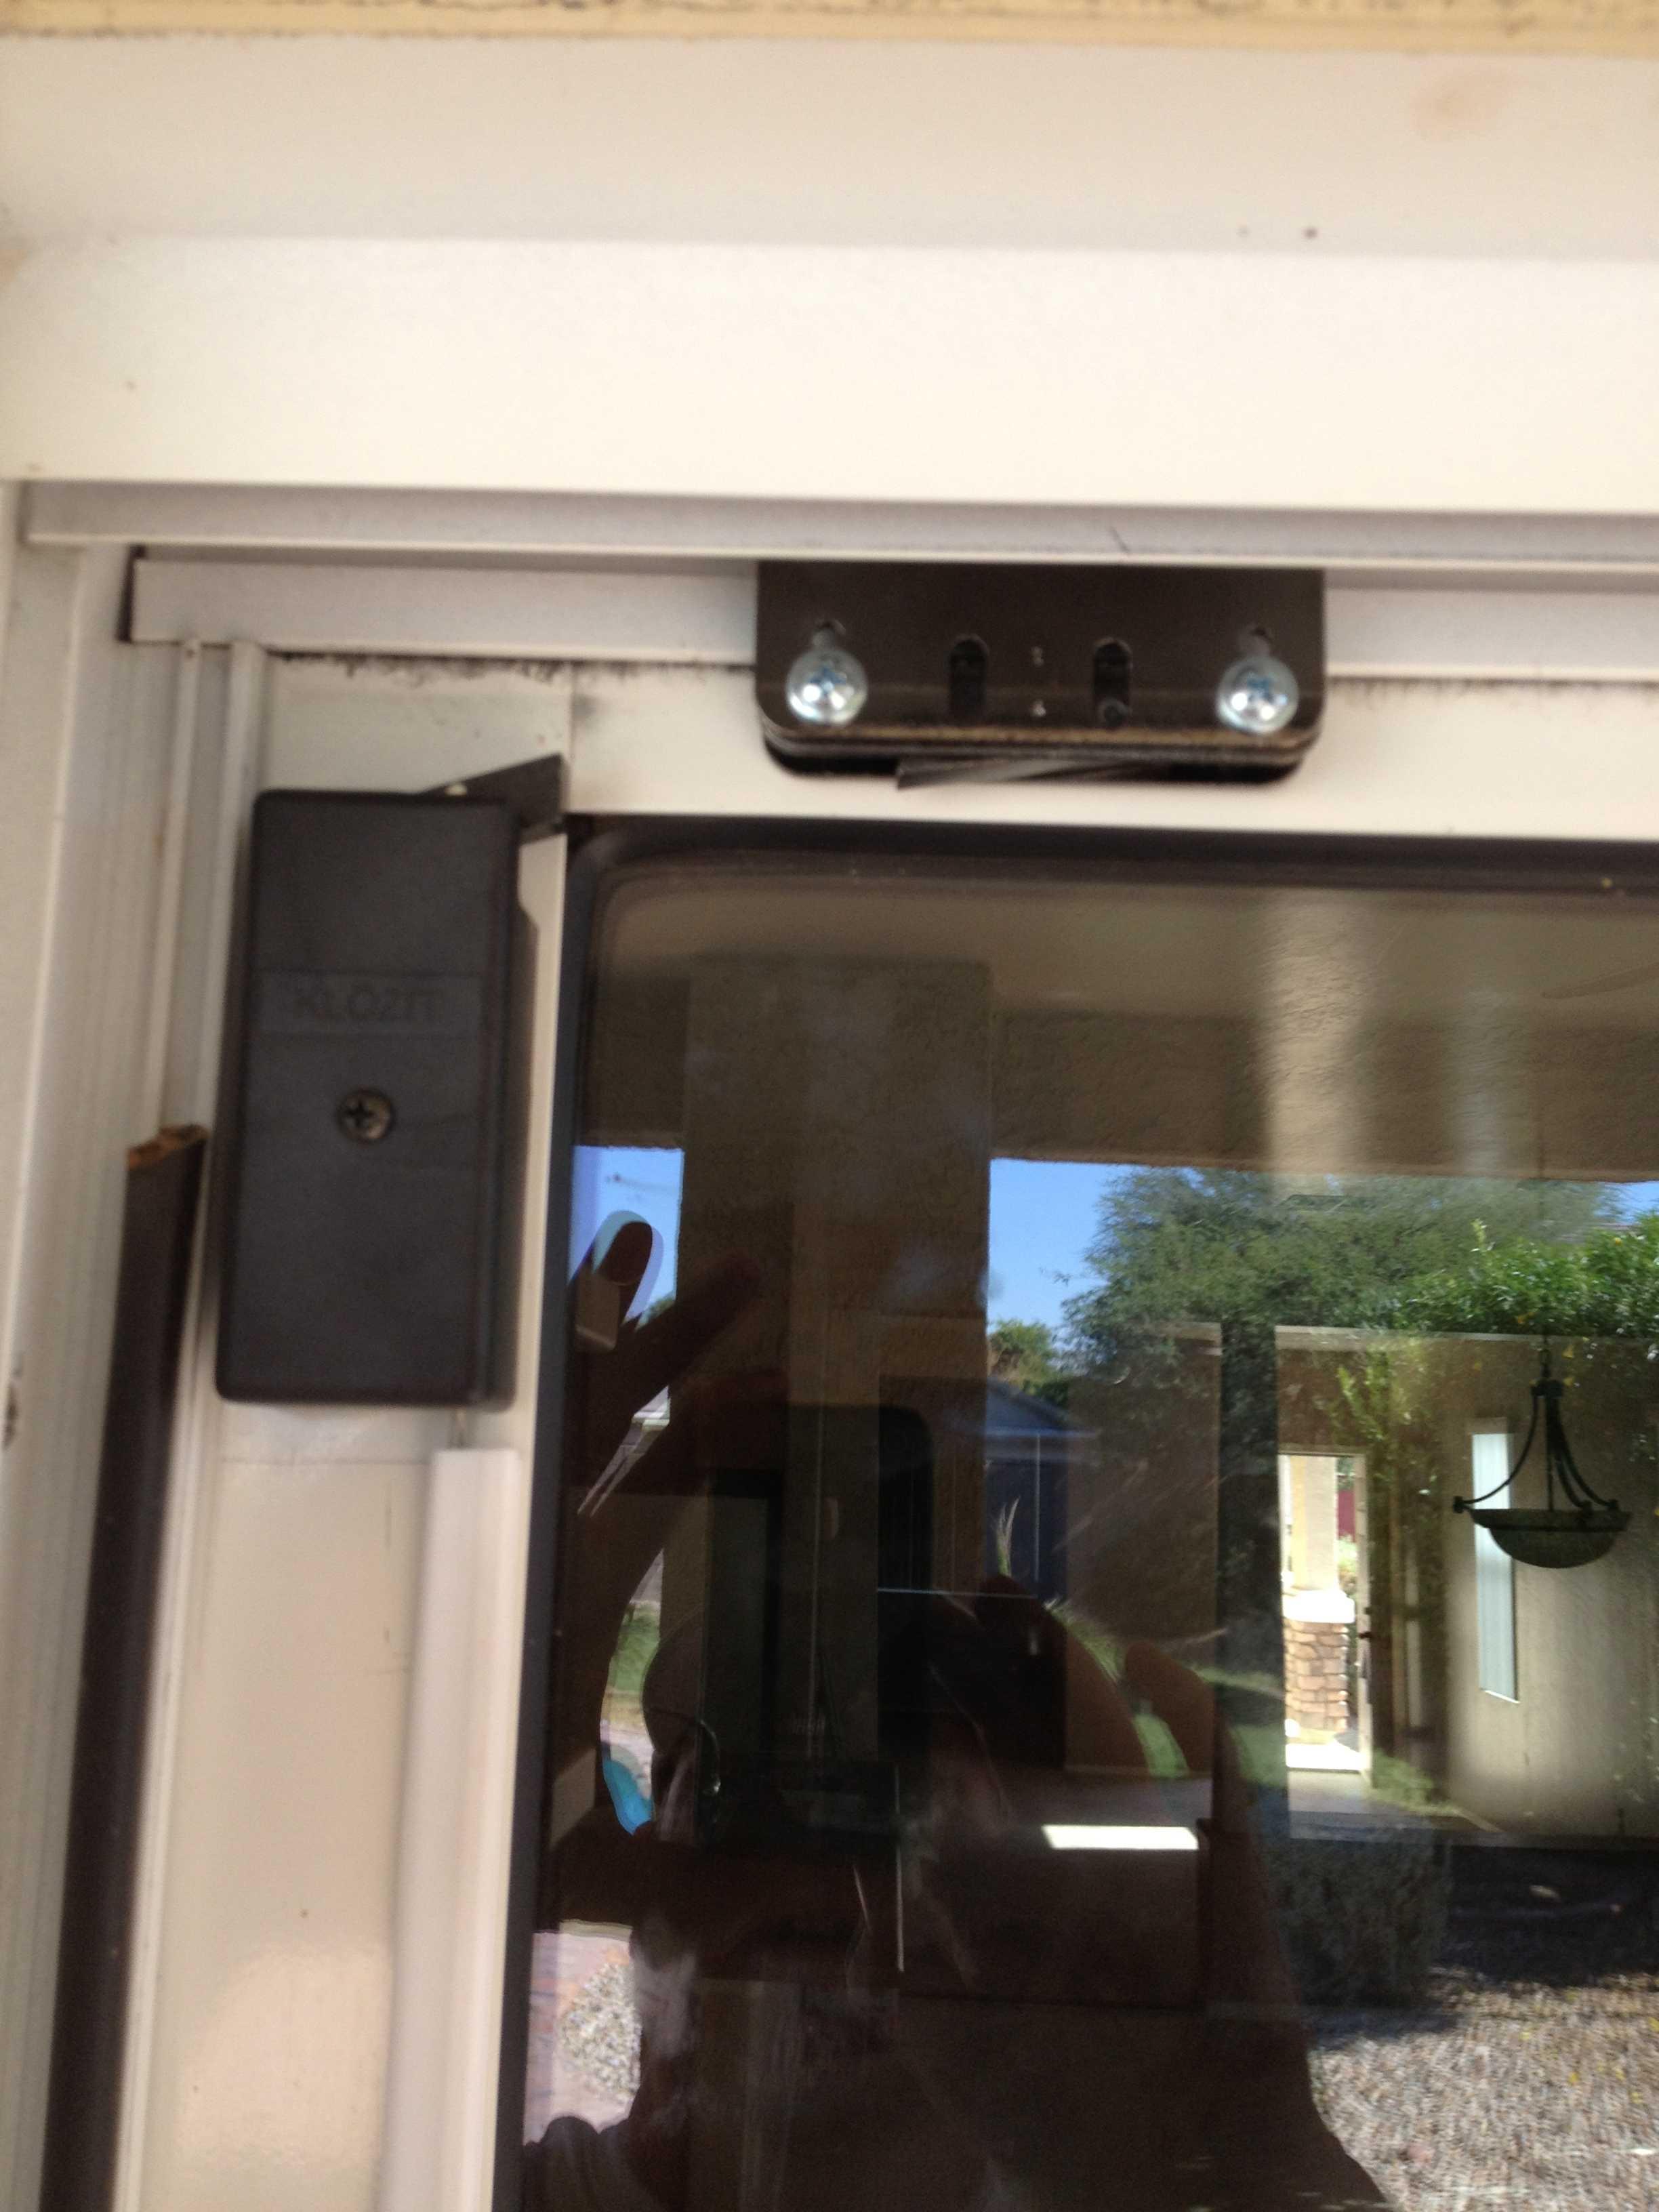 Sliding Glass Door Pool Safety Latchklozit sliding glass door latch system